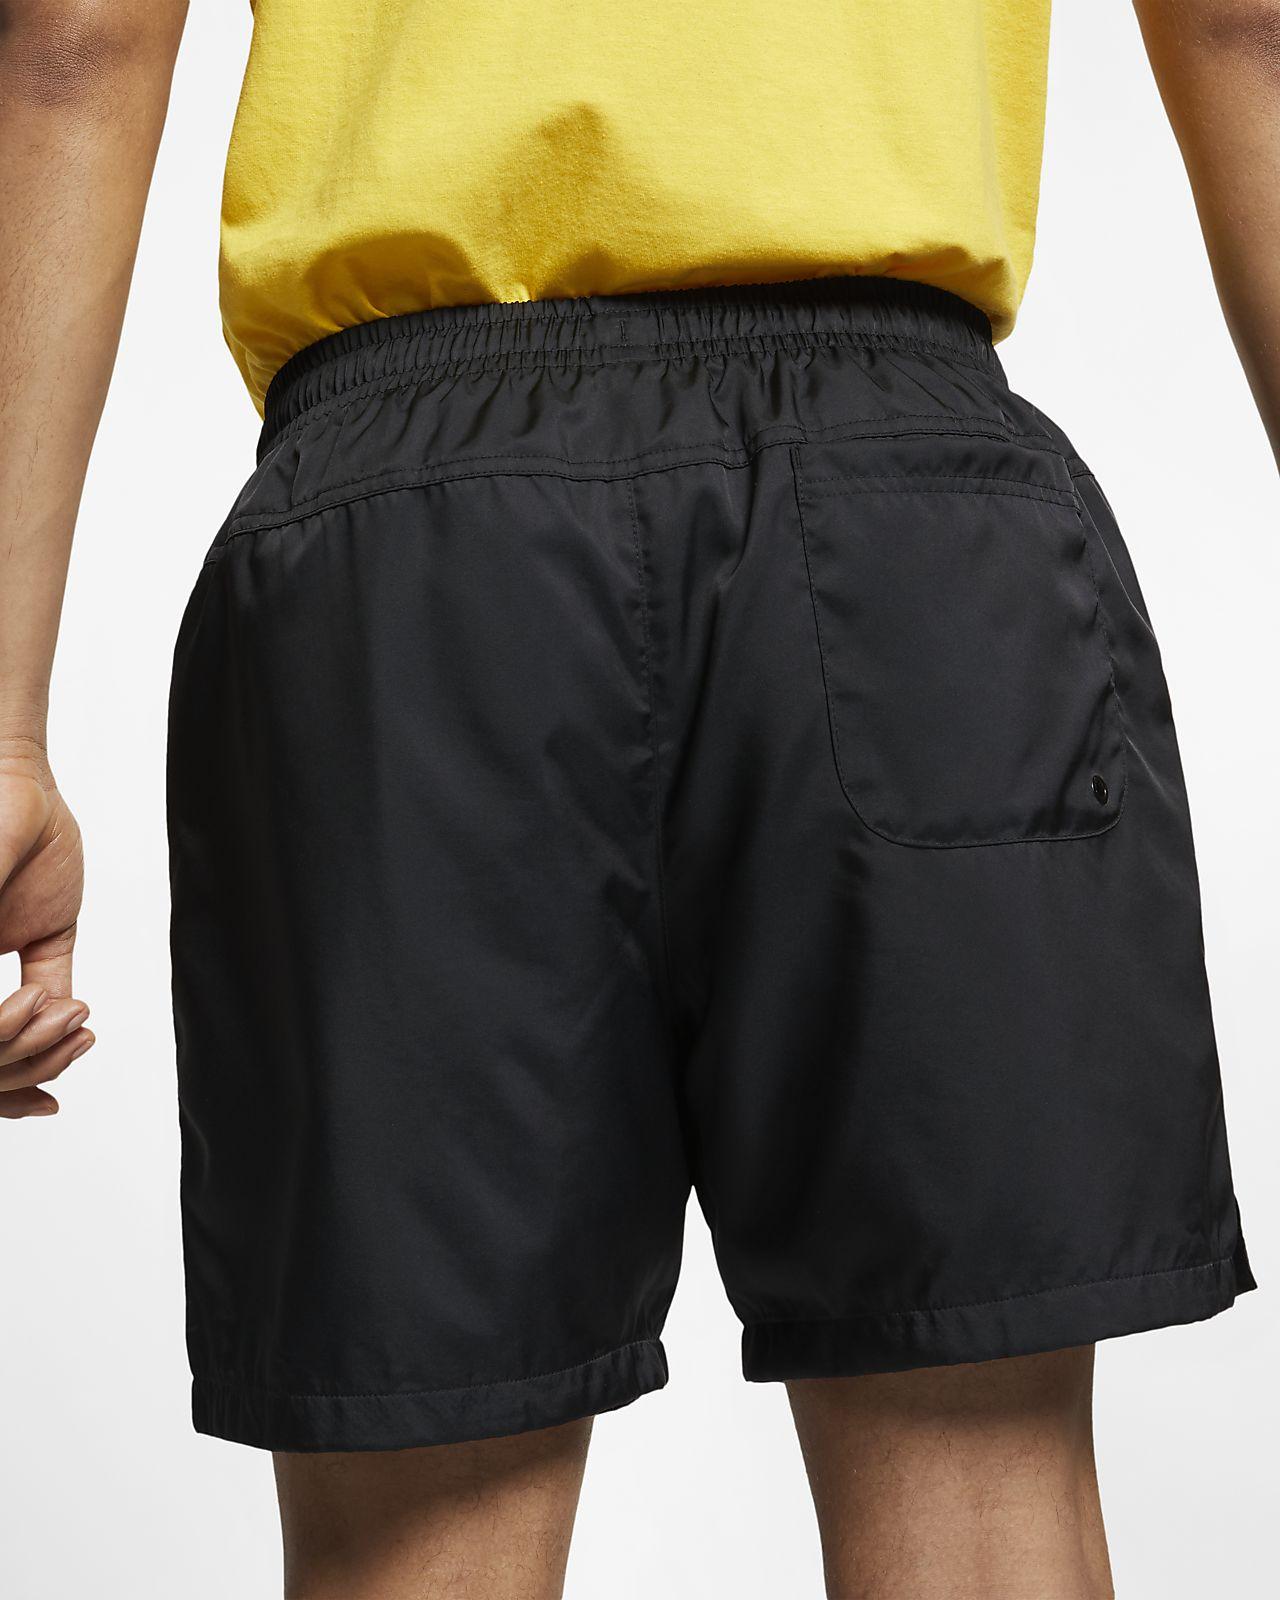 nike l shorts mens